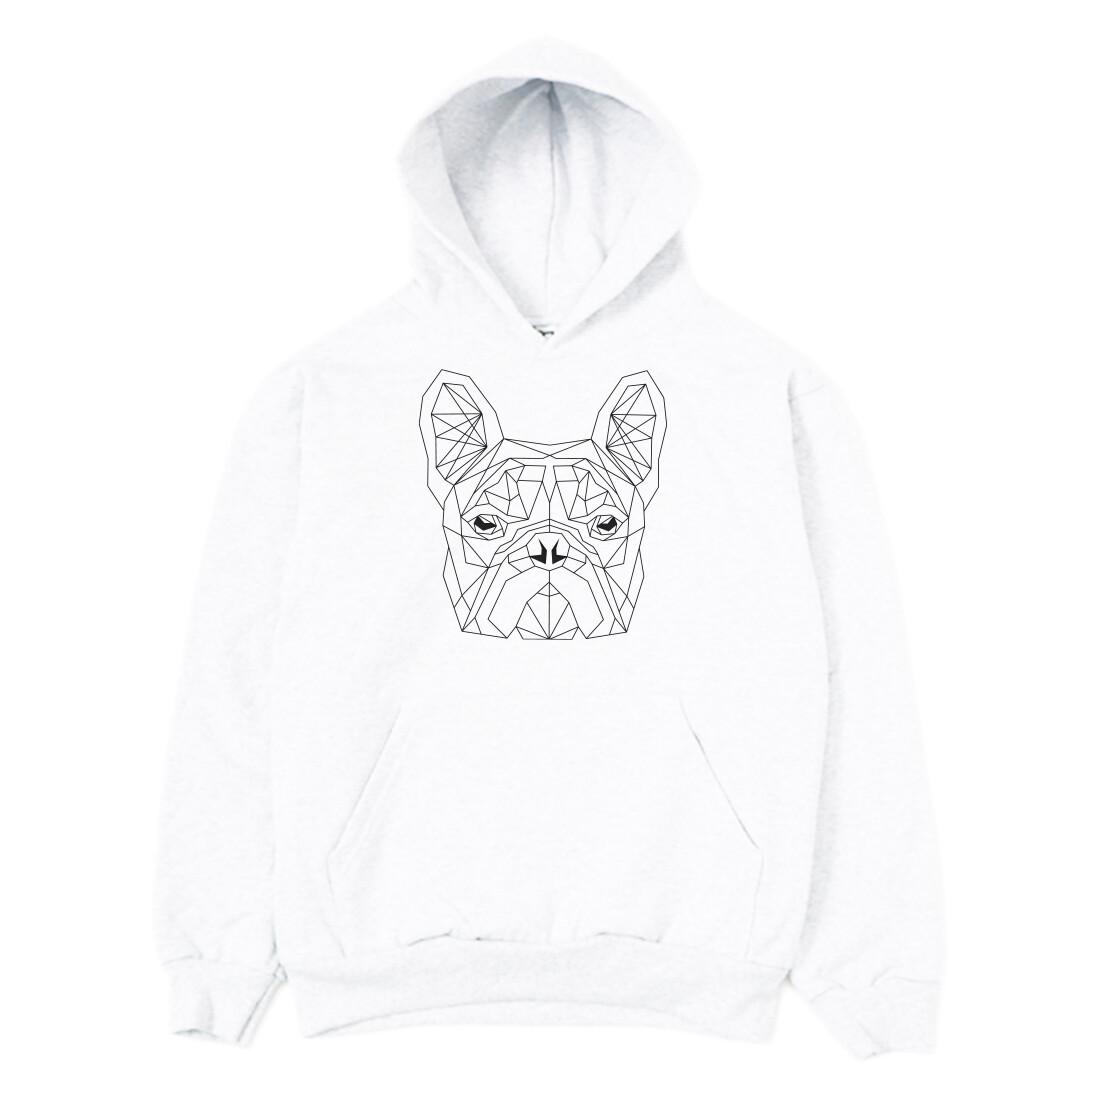 UNUSI Oversize White Hooded Sweatshirt With White DOG head Design